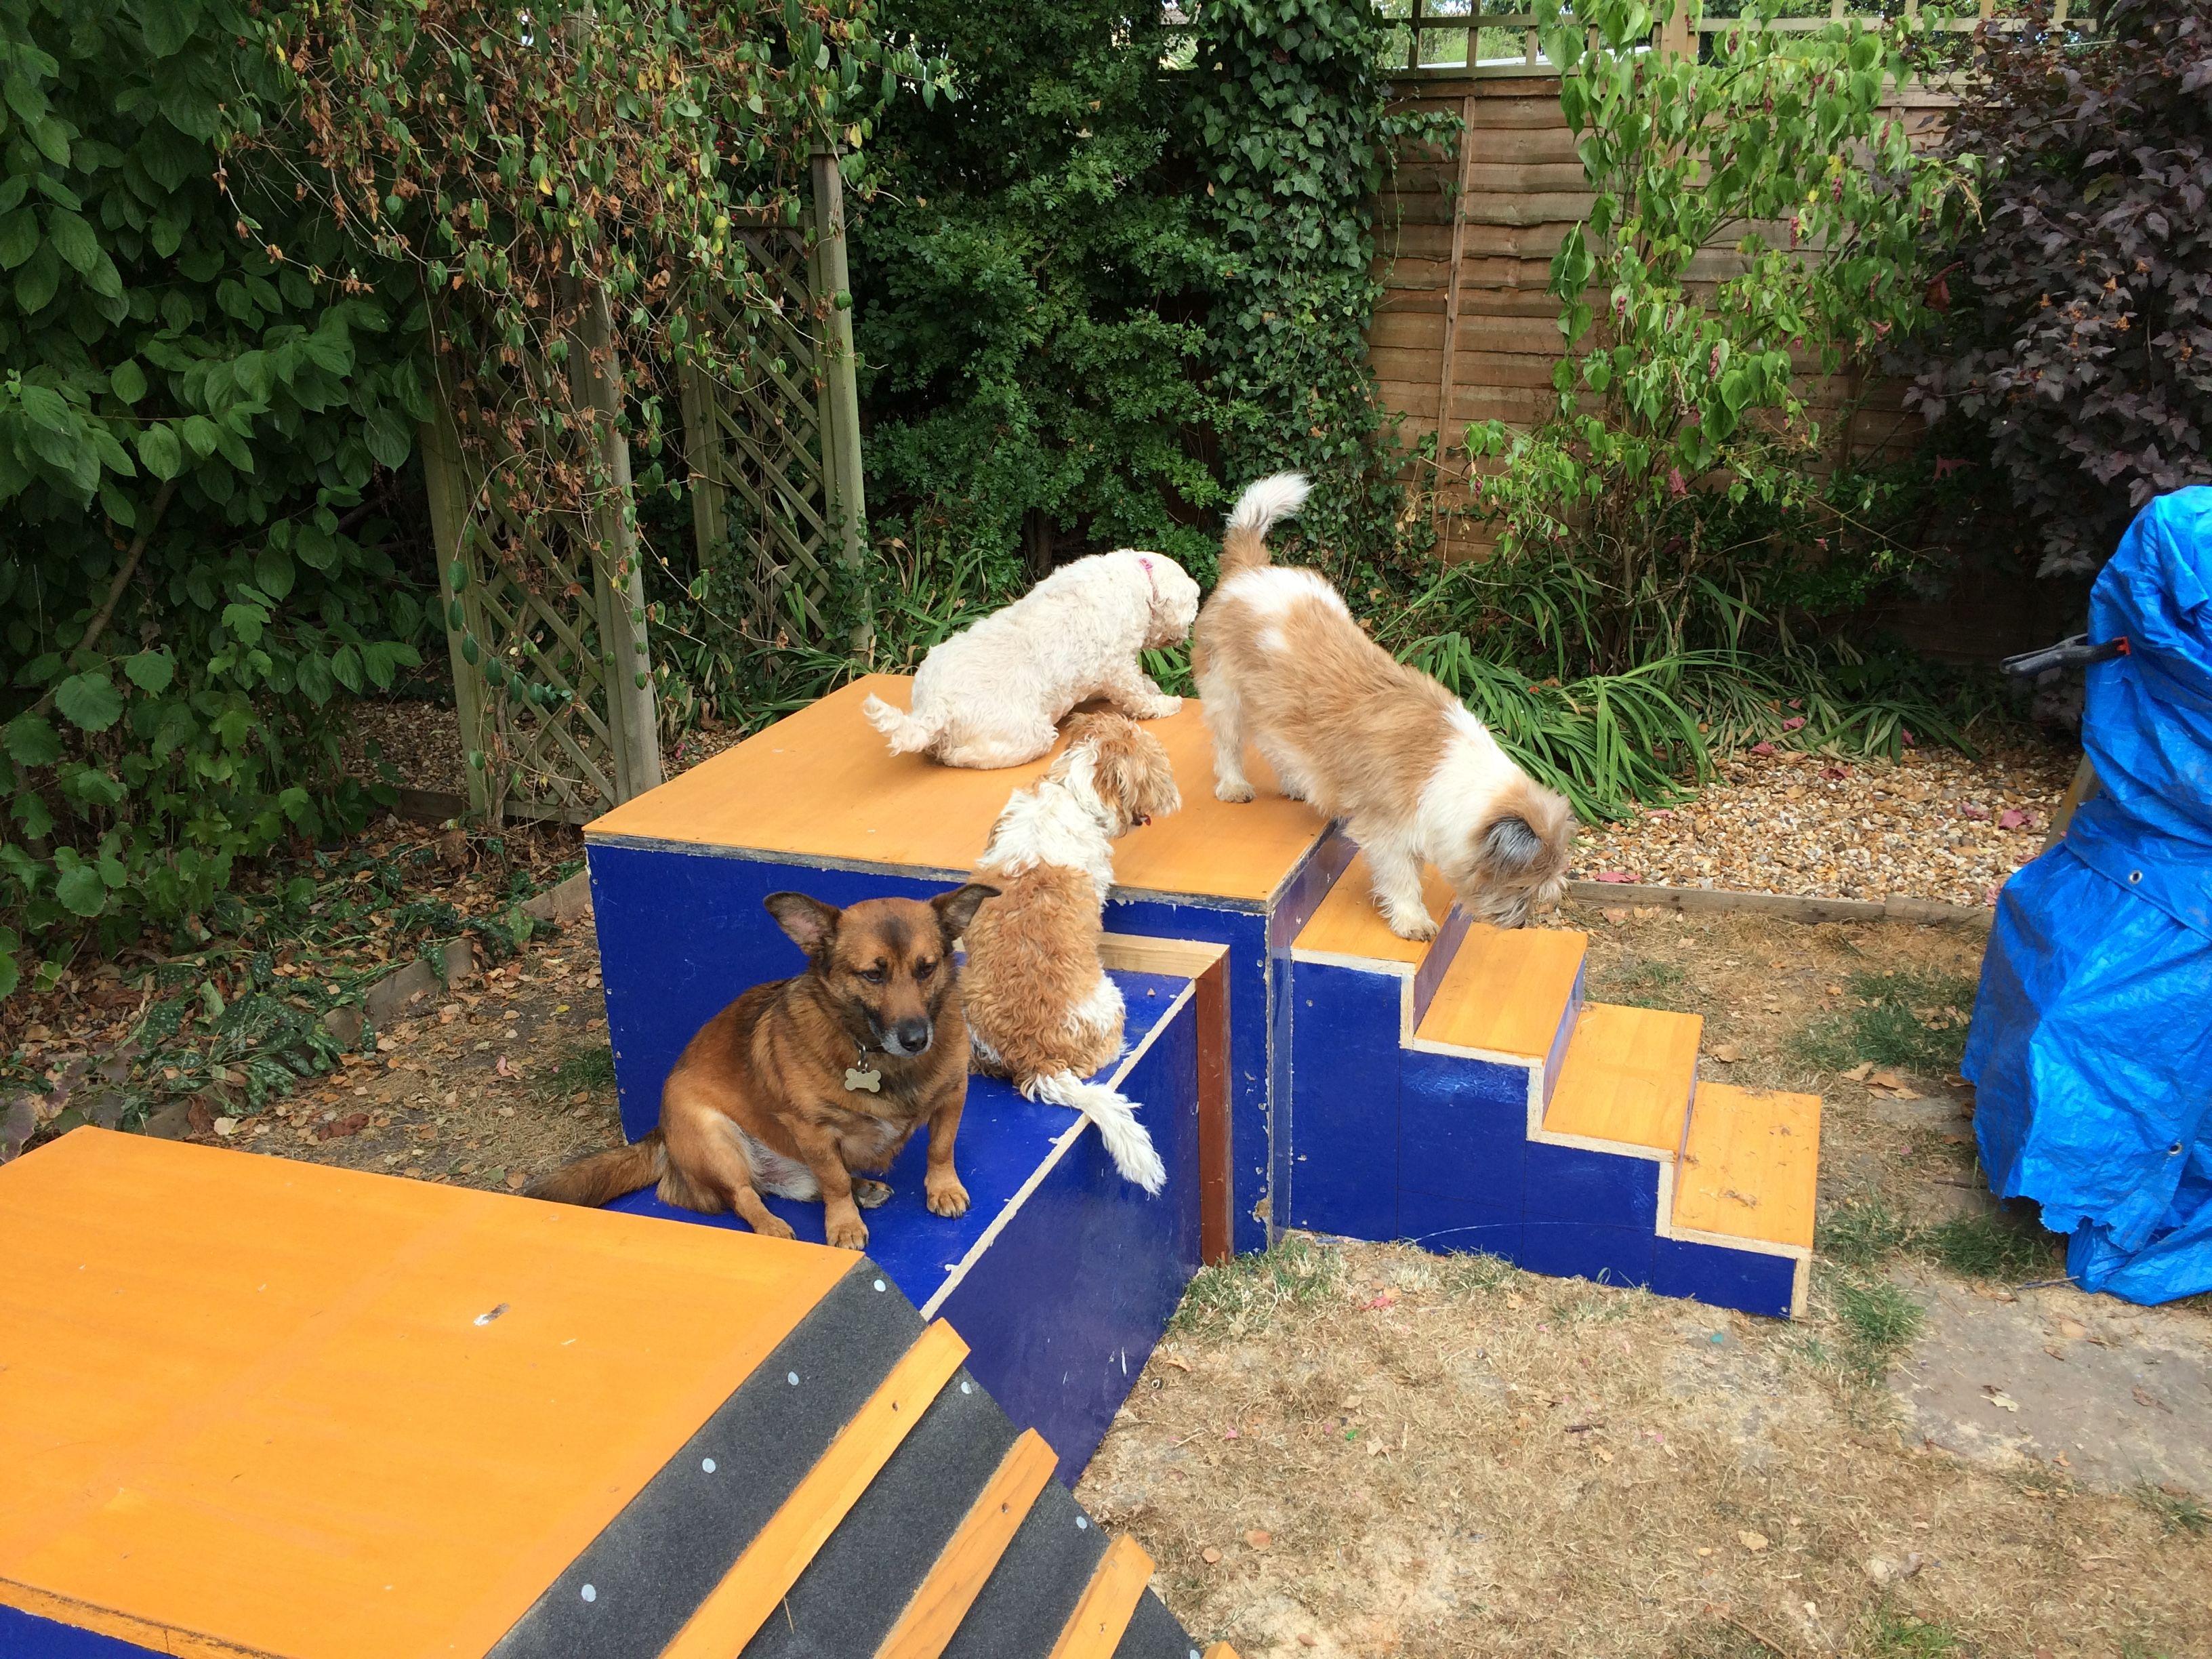 Our Diy Dog Playground Dog Playground Dog Training Obedience Diy Dog Stuff Diy backyard dog playground